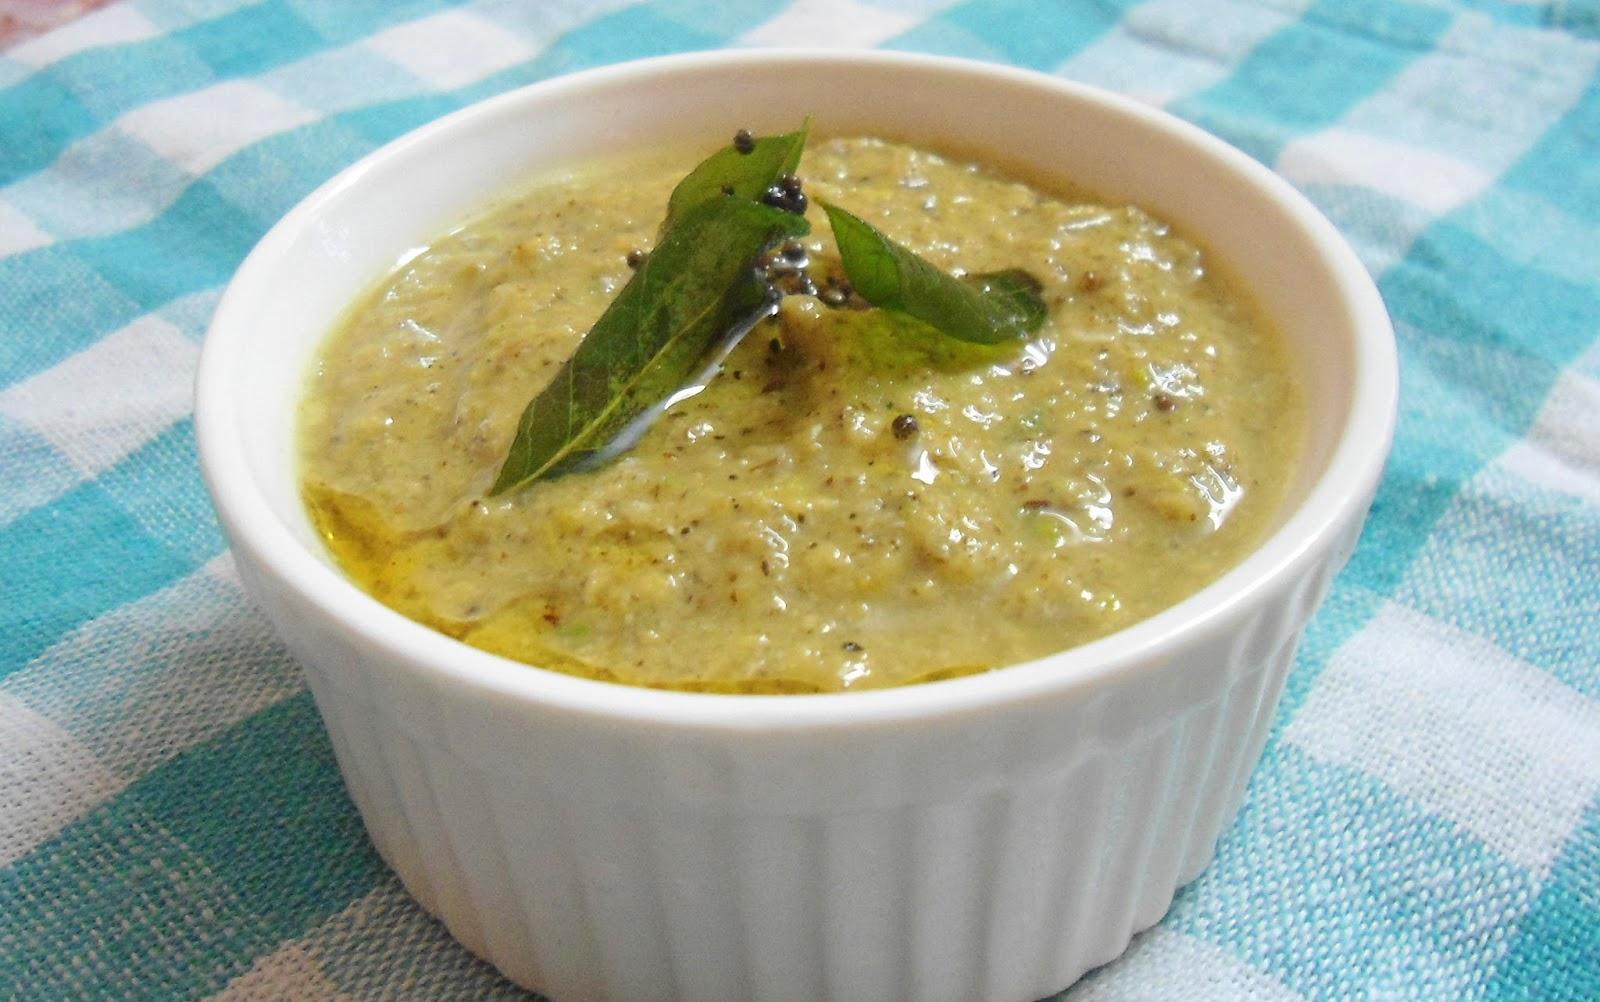 Babi 's Recipes: Green Tomato Chutney | Pachha Thakalai Chutney | Side ...